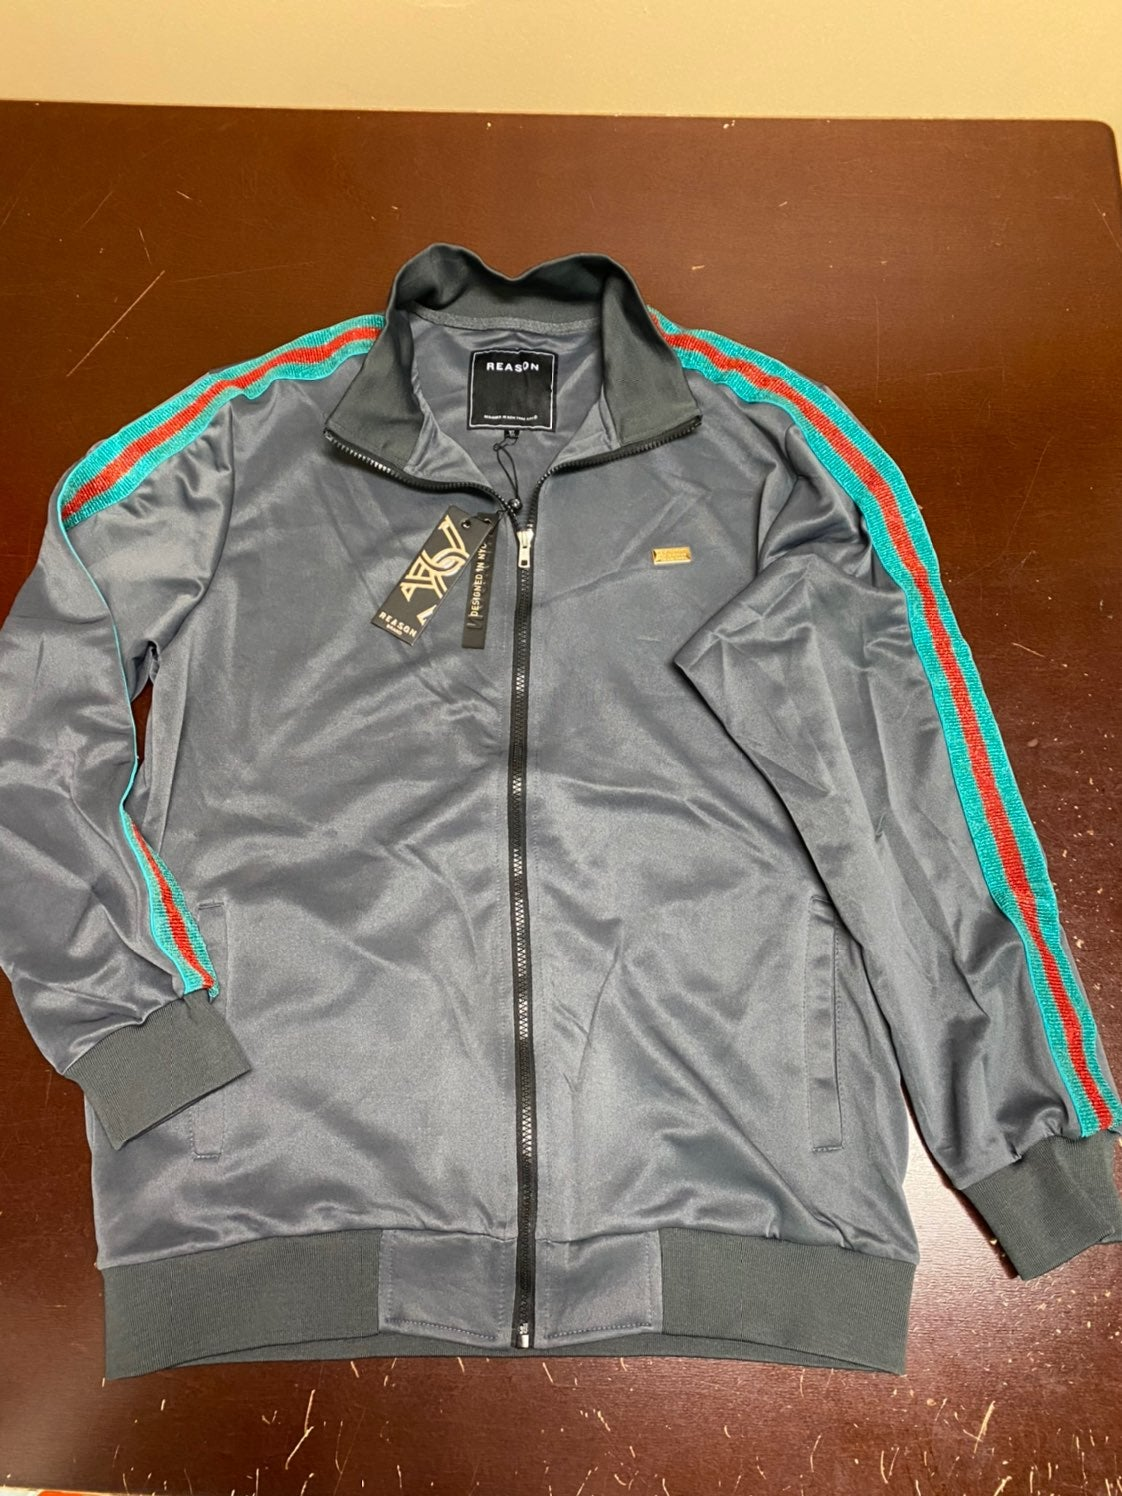 Reason clothing grey track jacket XL